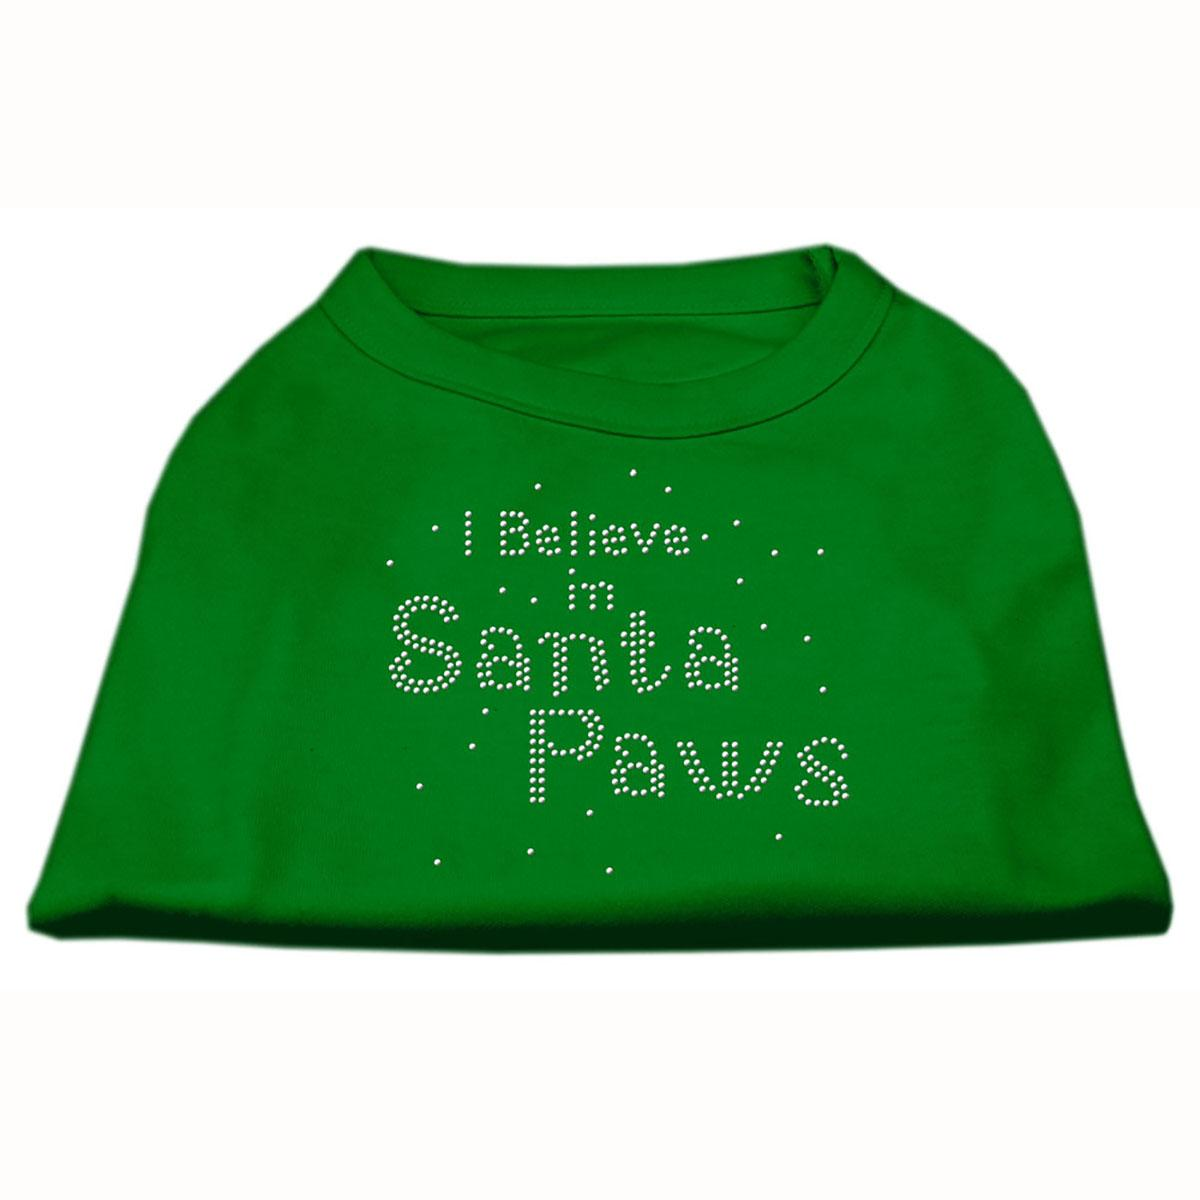 I Believe in Santa Paws Screen Print Dog Shirt - Green